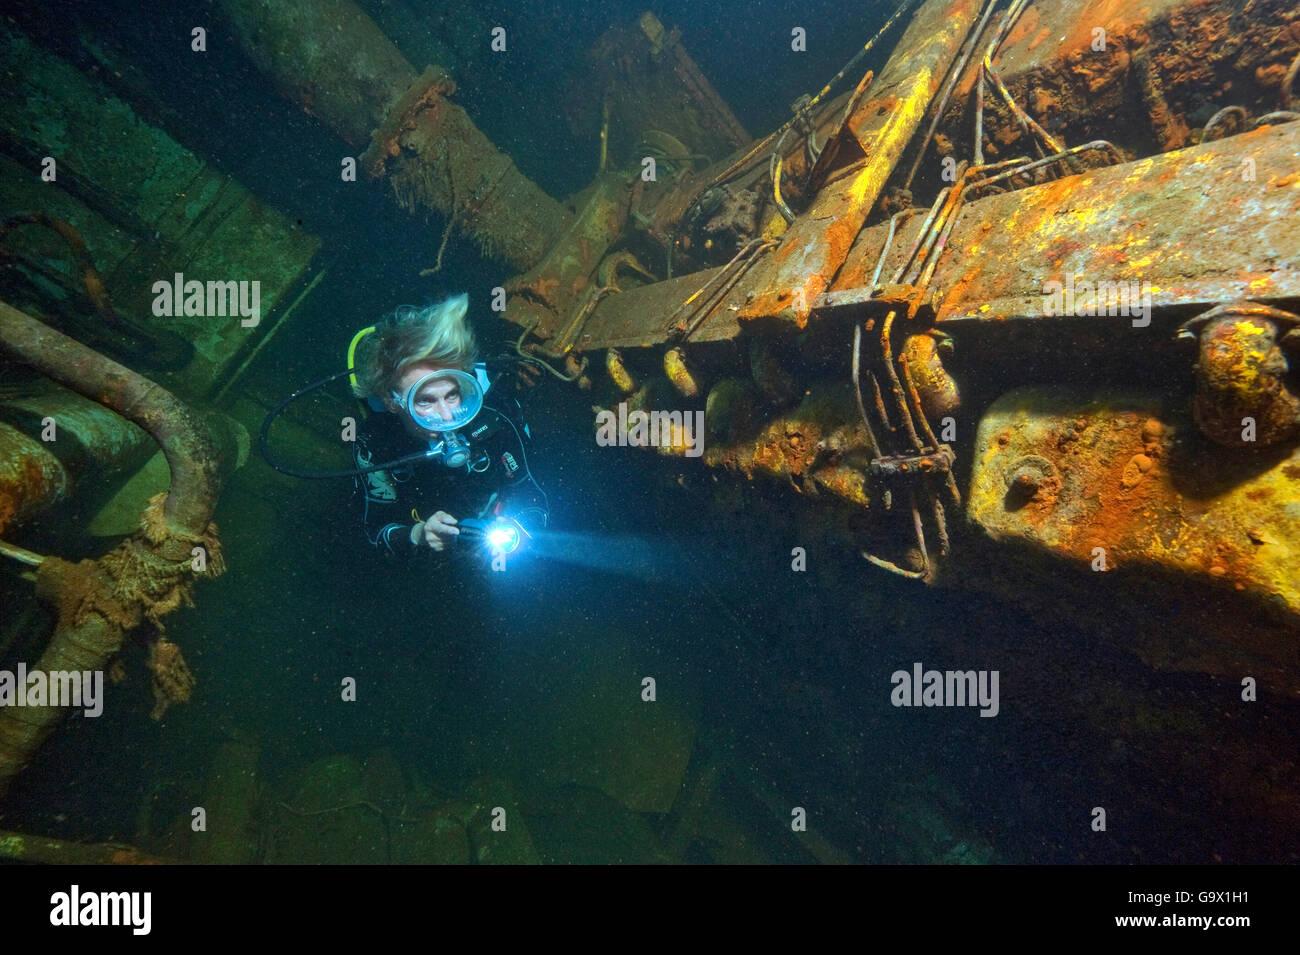 Relitto El Pejin, sala motore underwaterphoto, Tabaiba, Tenerife, Isole Canaray, Spagna, Europa, Atlantic / Tabaiba Immagini Stock